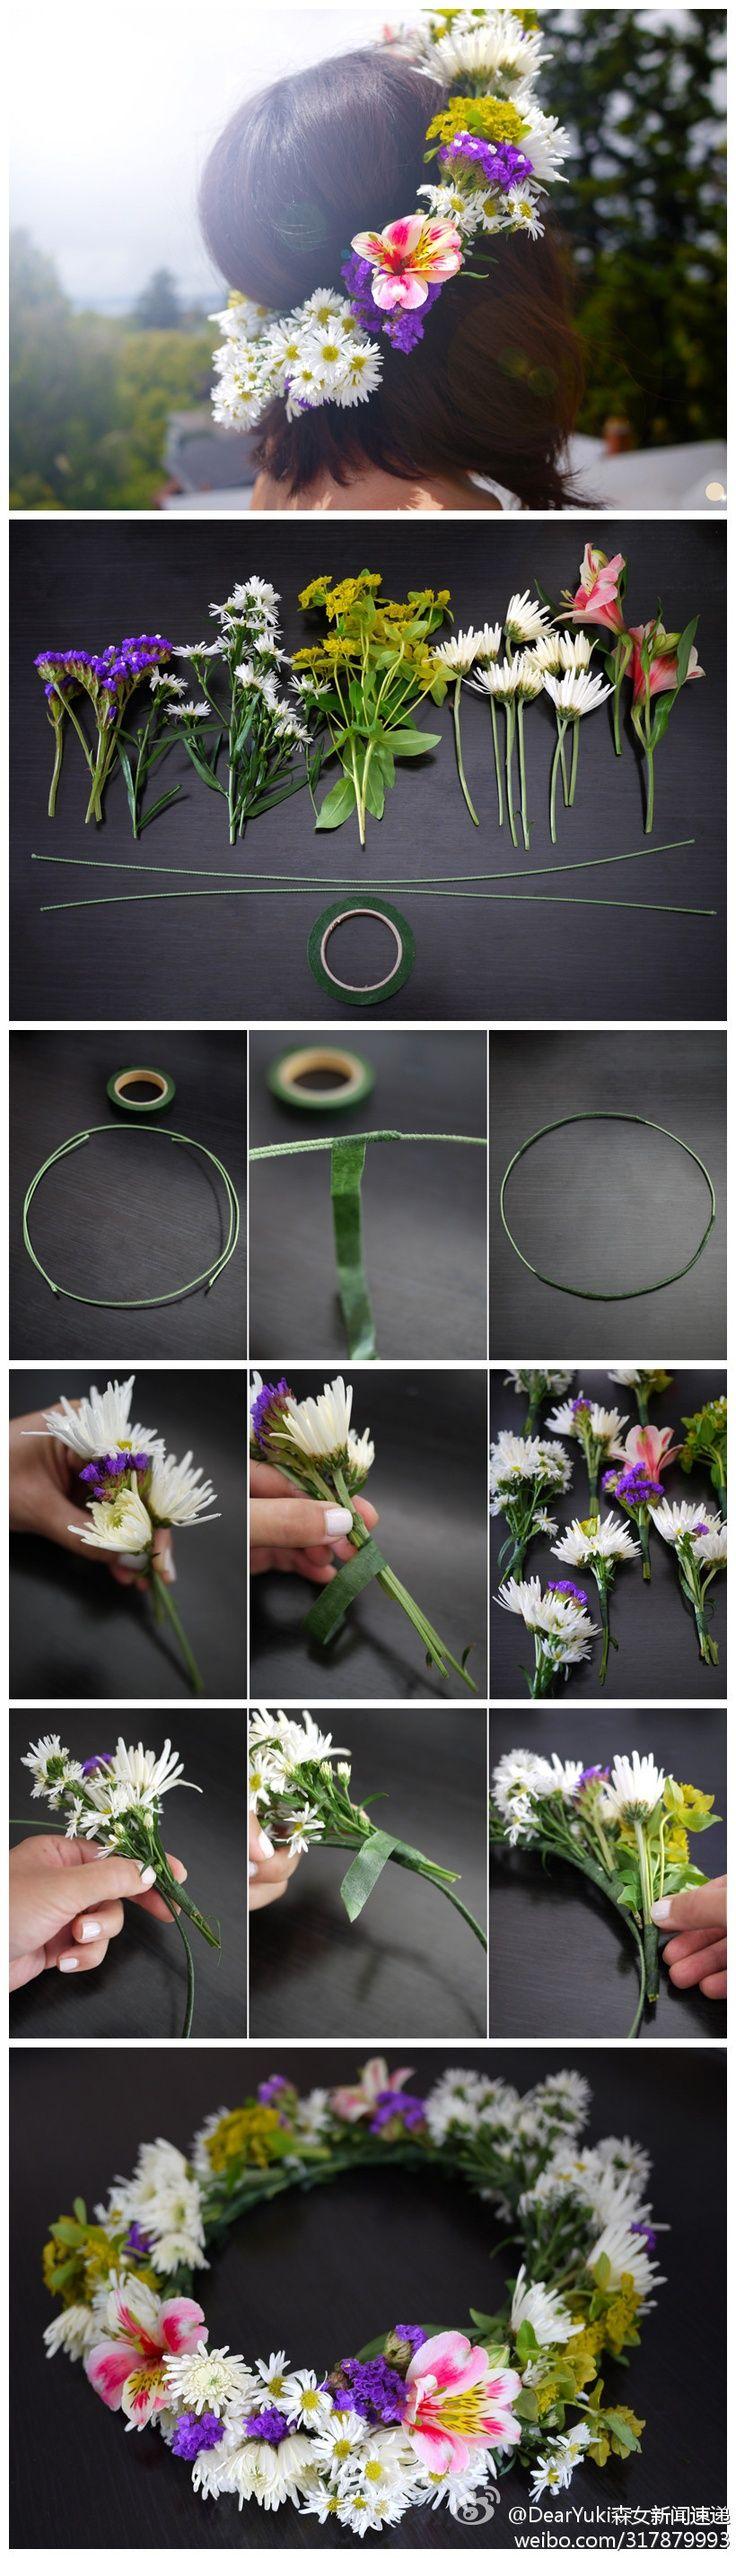 DIY flower crown - Perfect for a summer wedding!